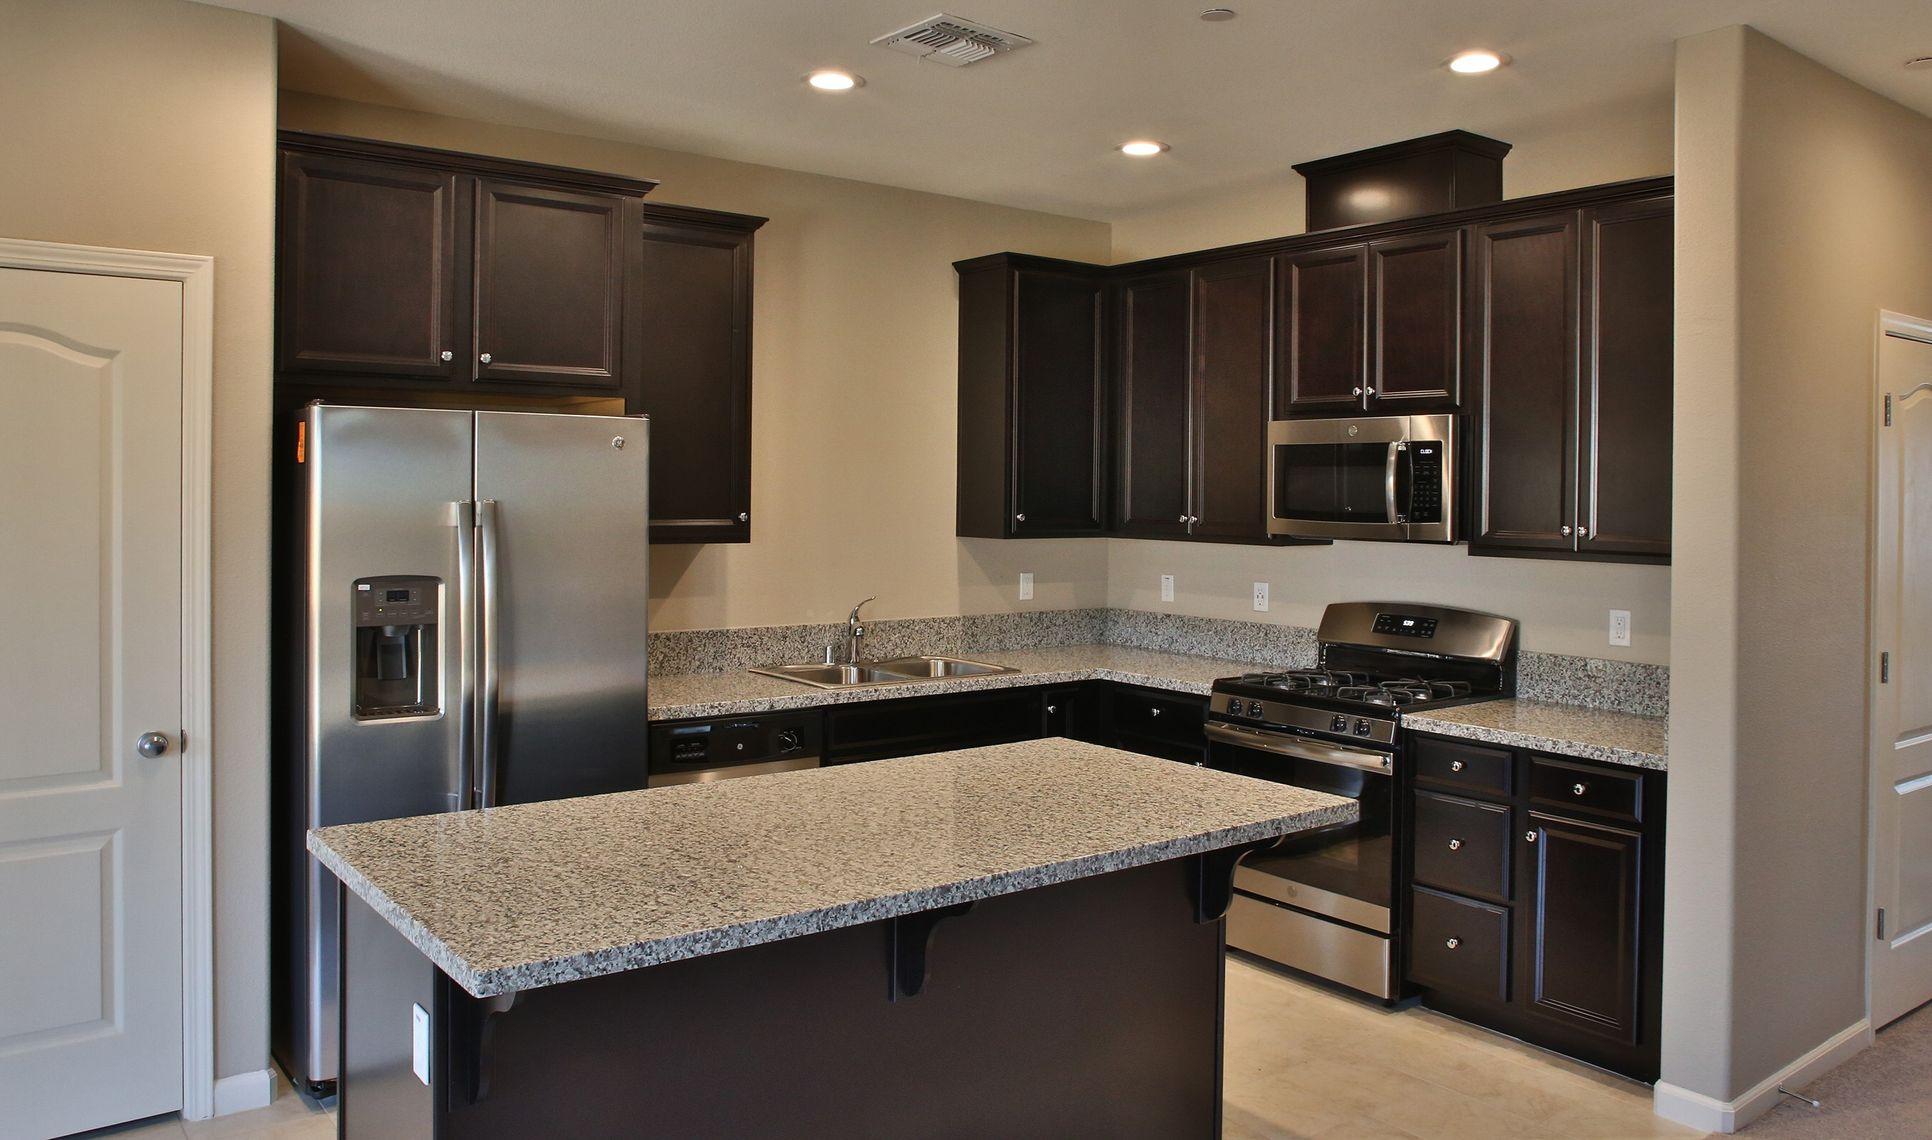 Interior:Elegant kitchen